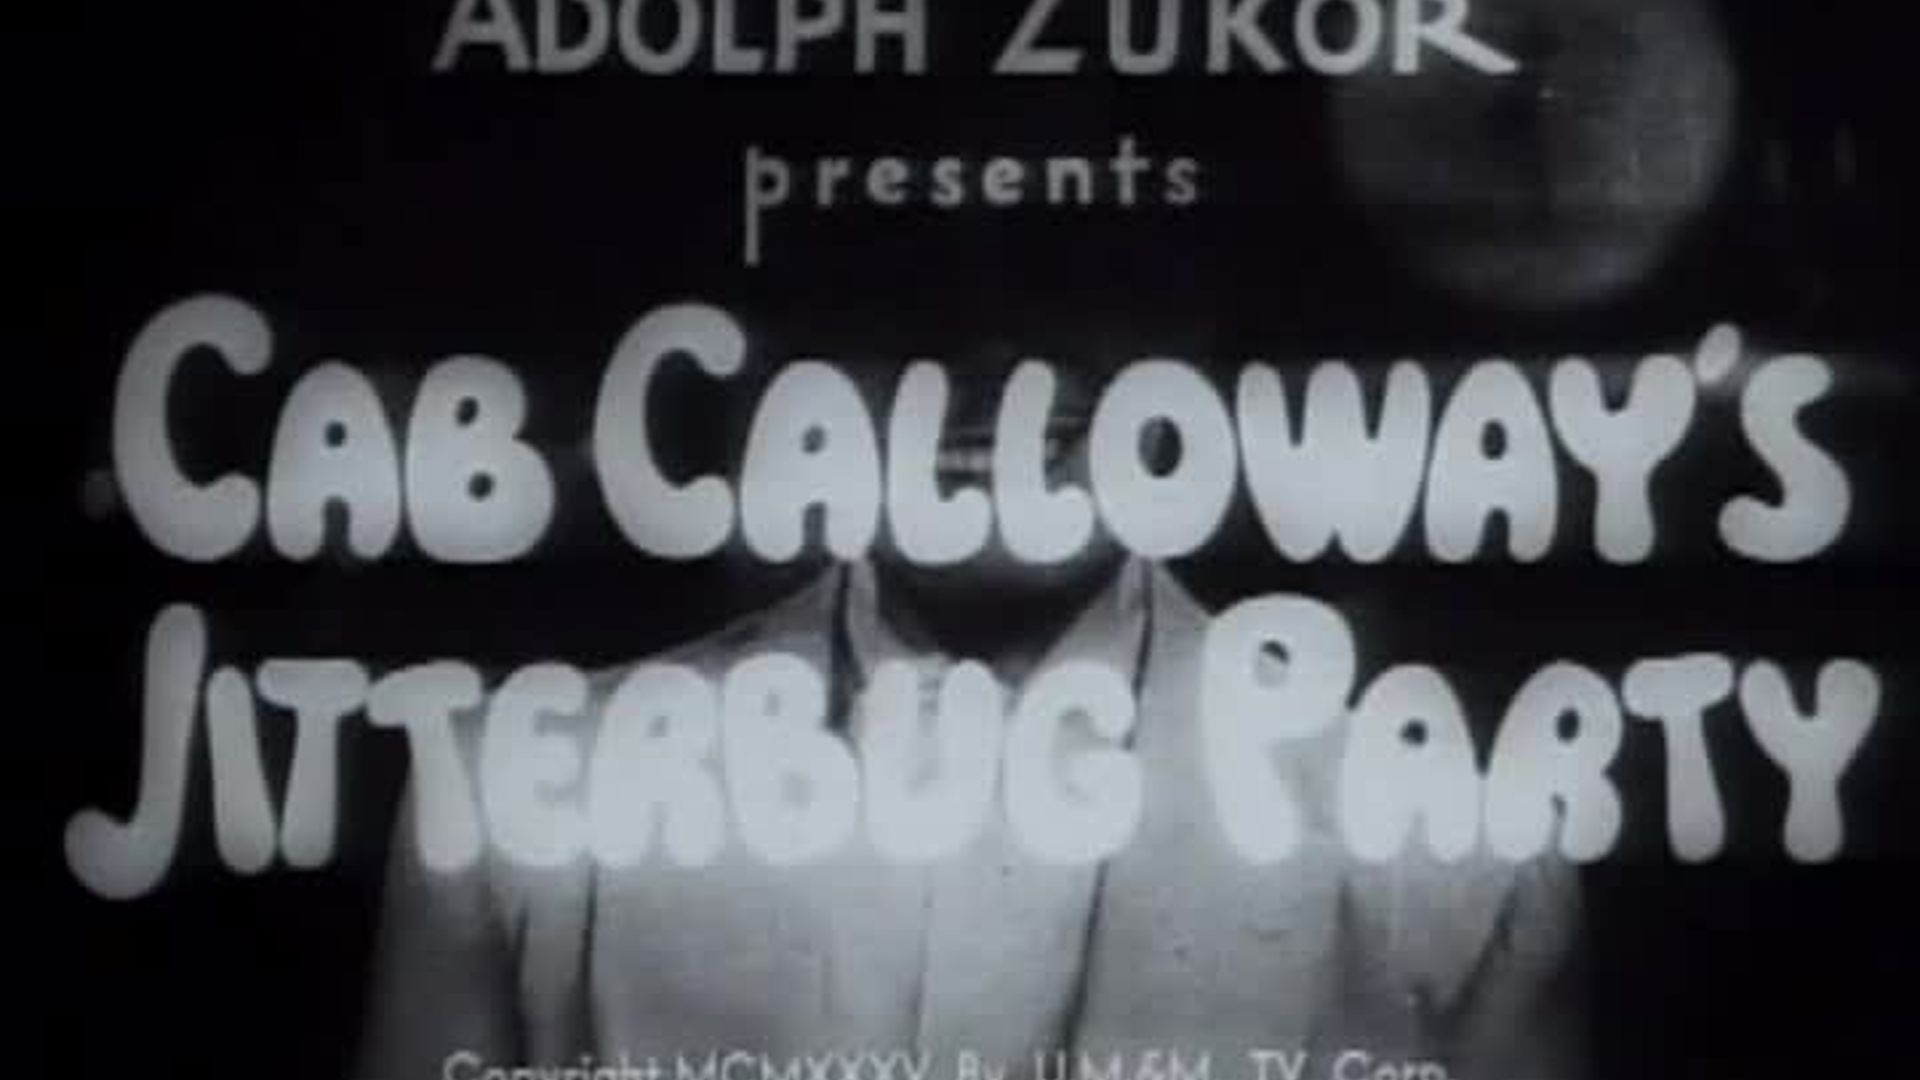 Cab Calloway's Jitterbug Party